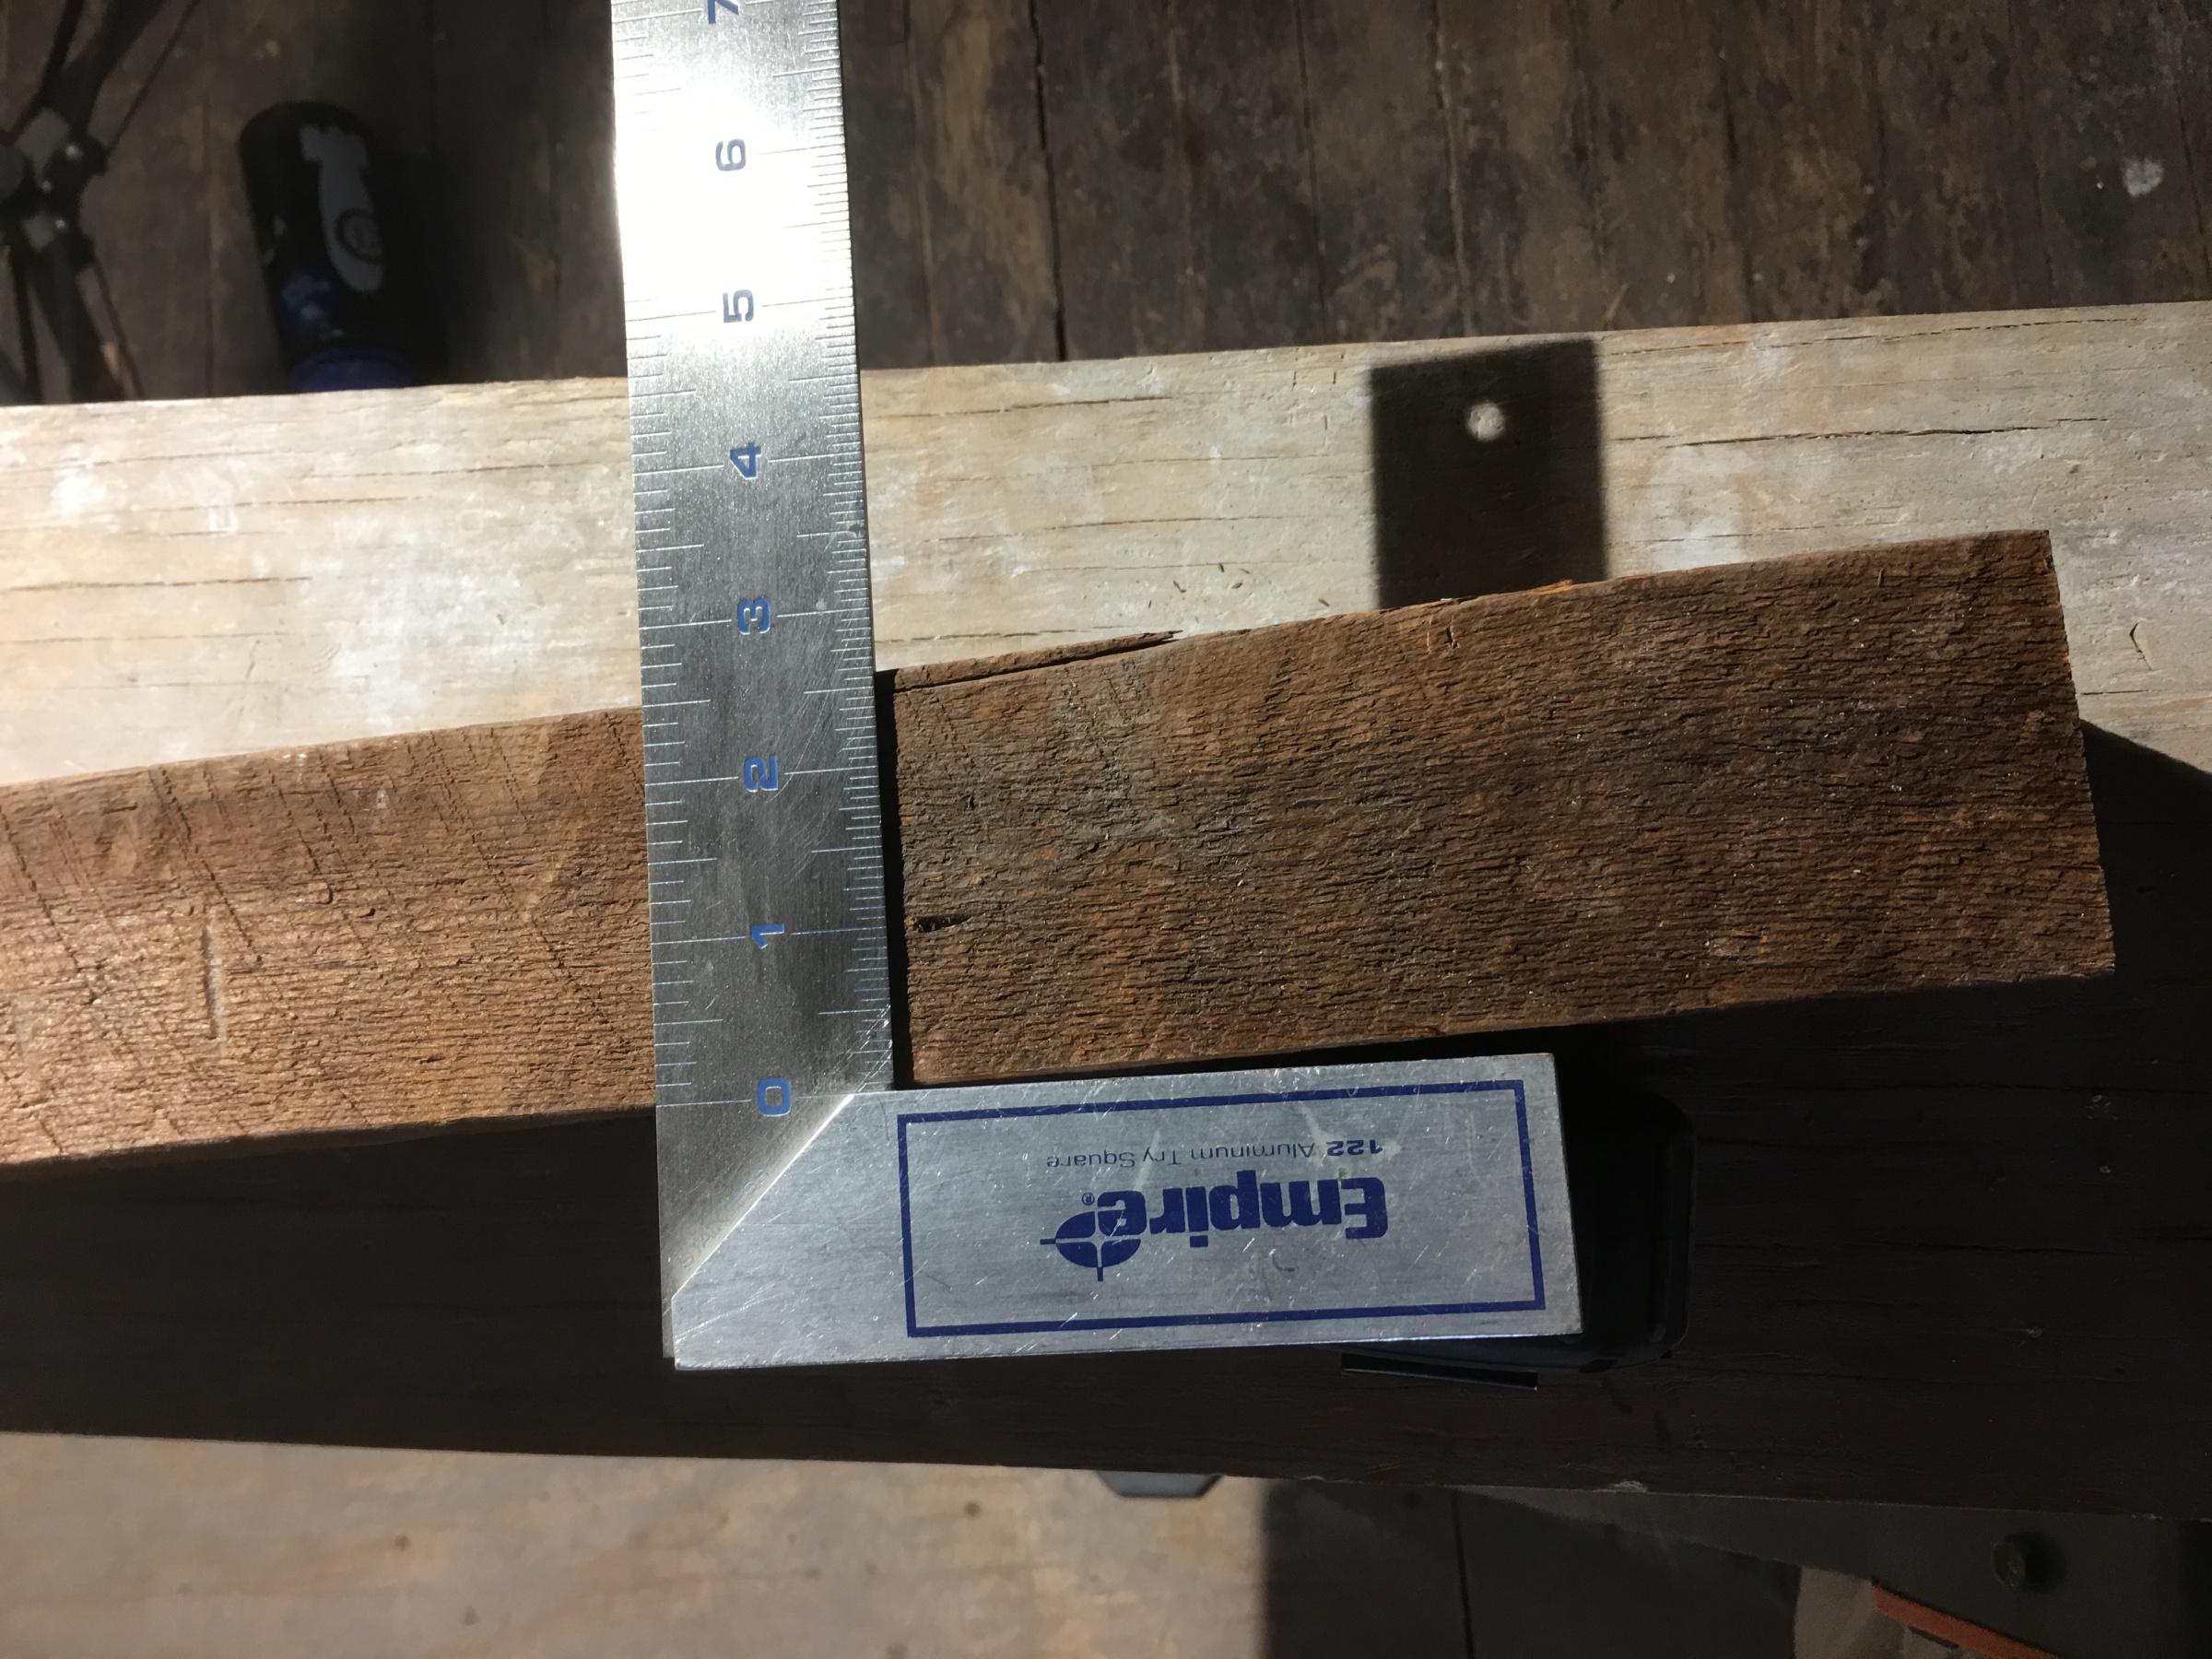 Relcaimed wood to build stair treads-img_4636.jpg